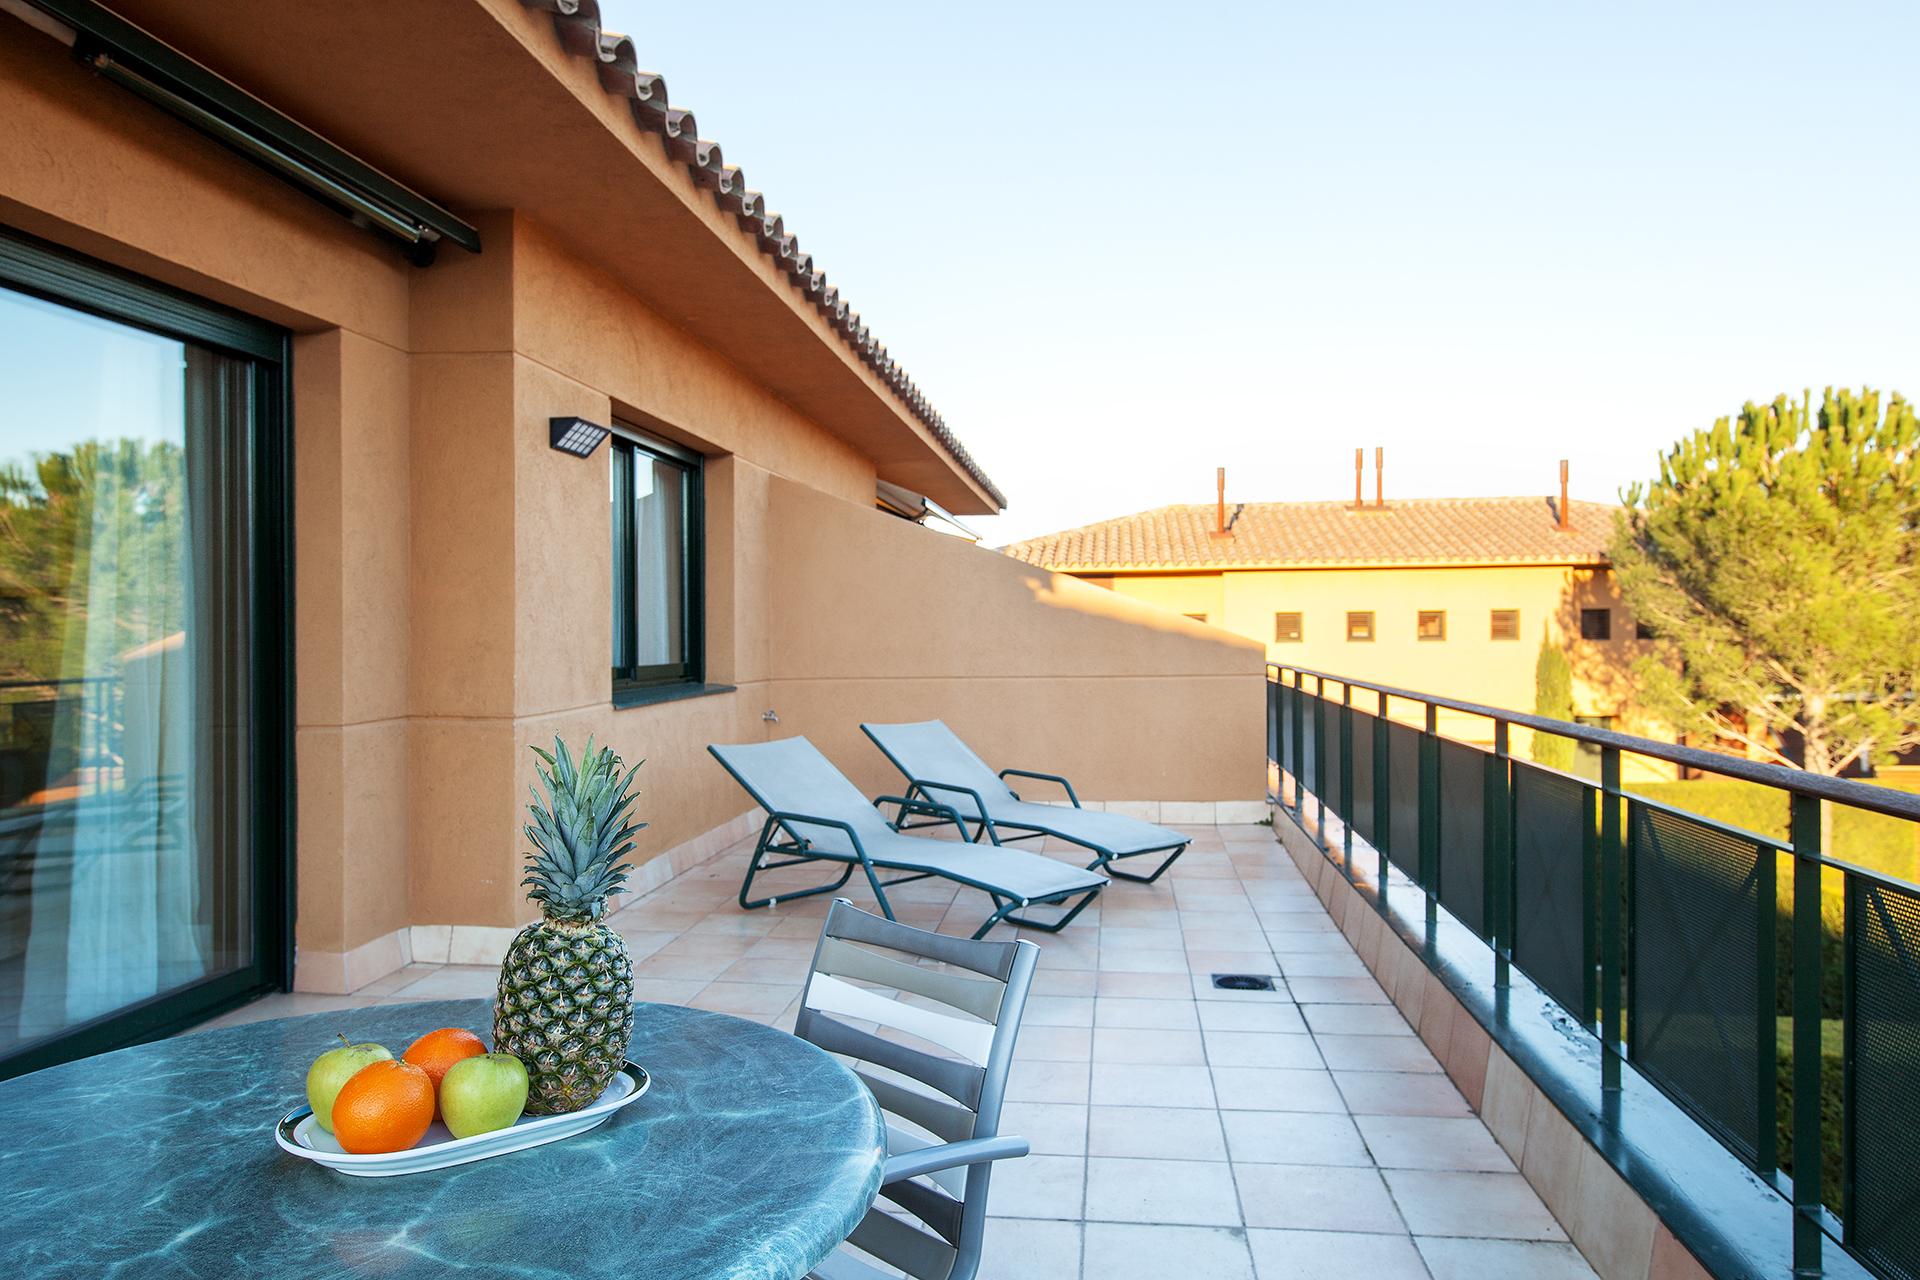 Golf-Expedition-Golf-reizen-Spanje-Regio-Barcelona-TorreMirona-Golf-&-Spa-Resort-balcony